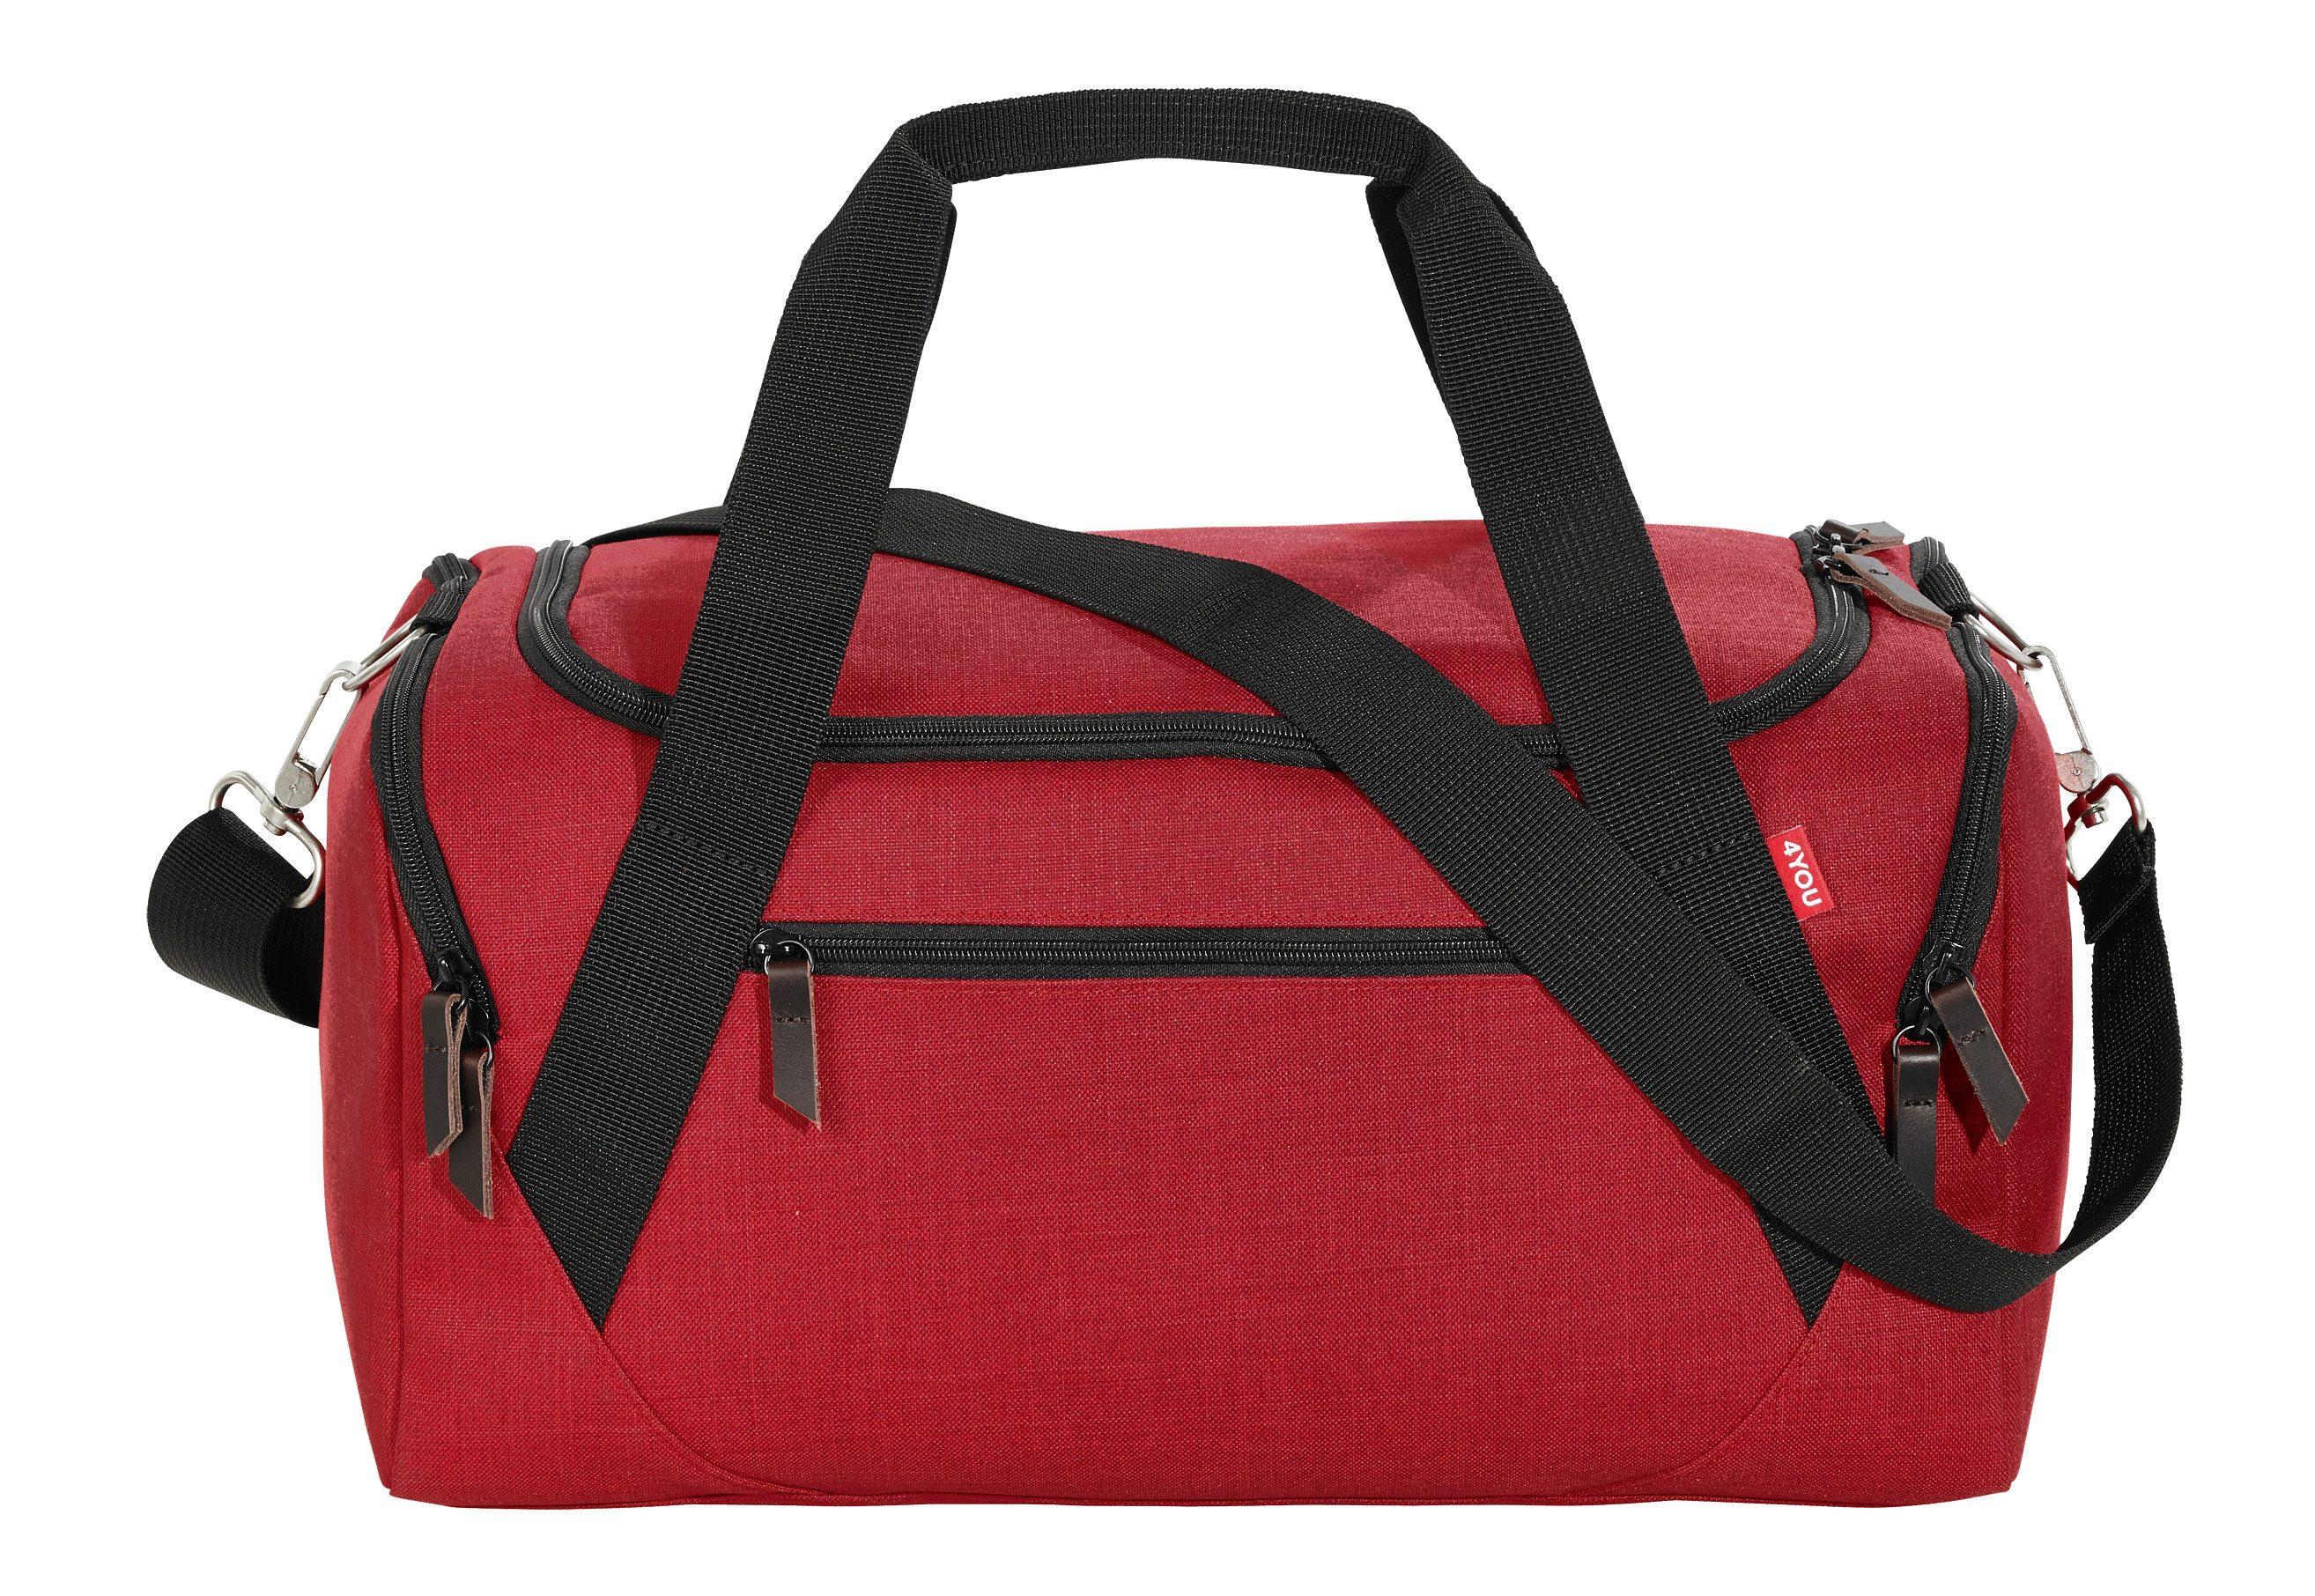 4YOU Sporttasche, Soft Red, »Sportbag«